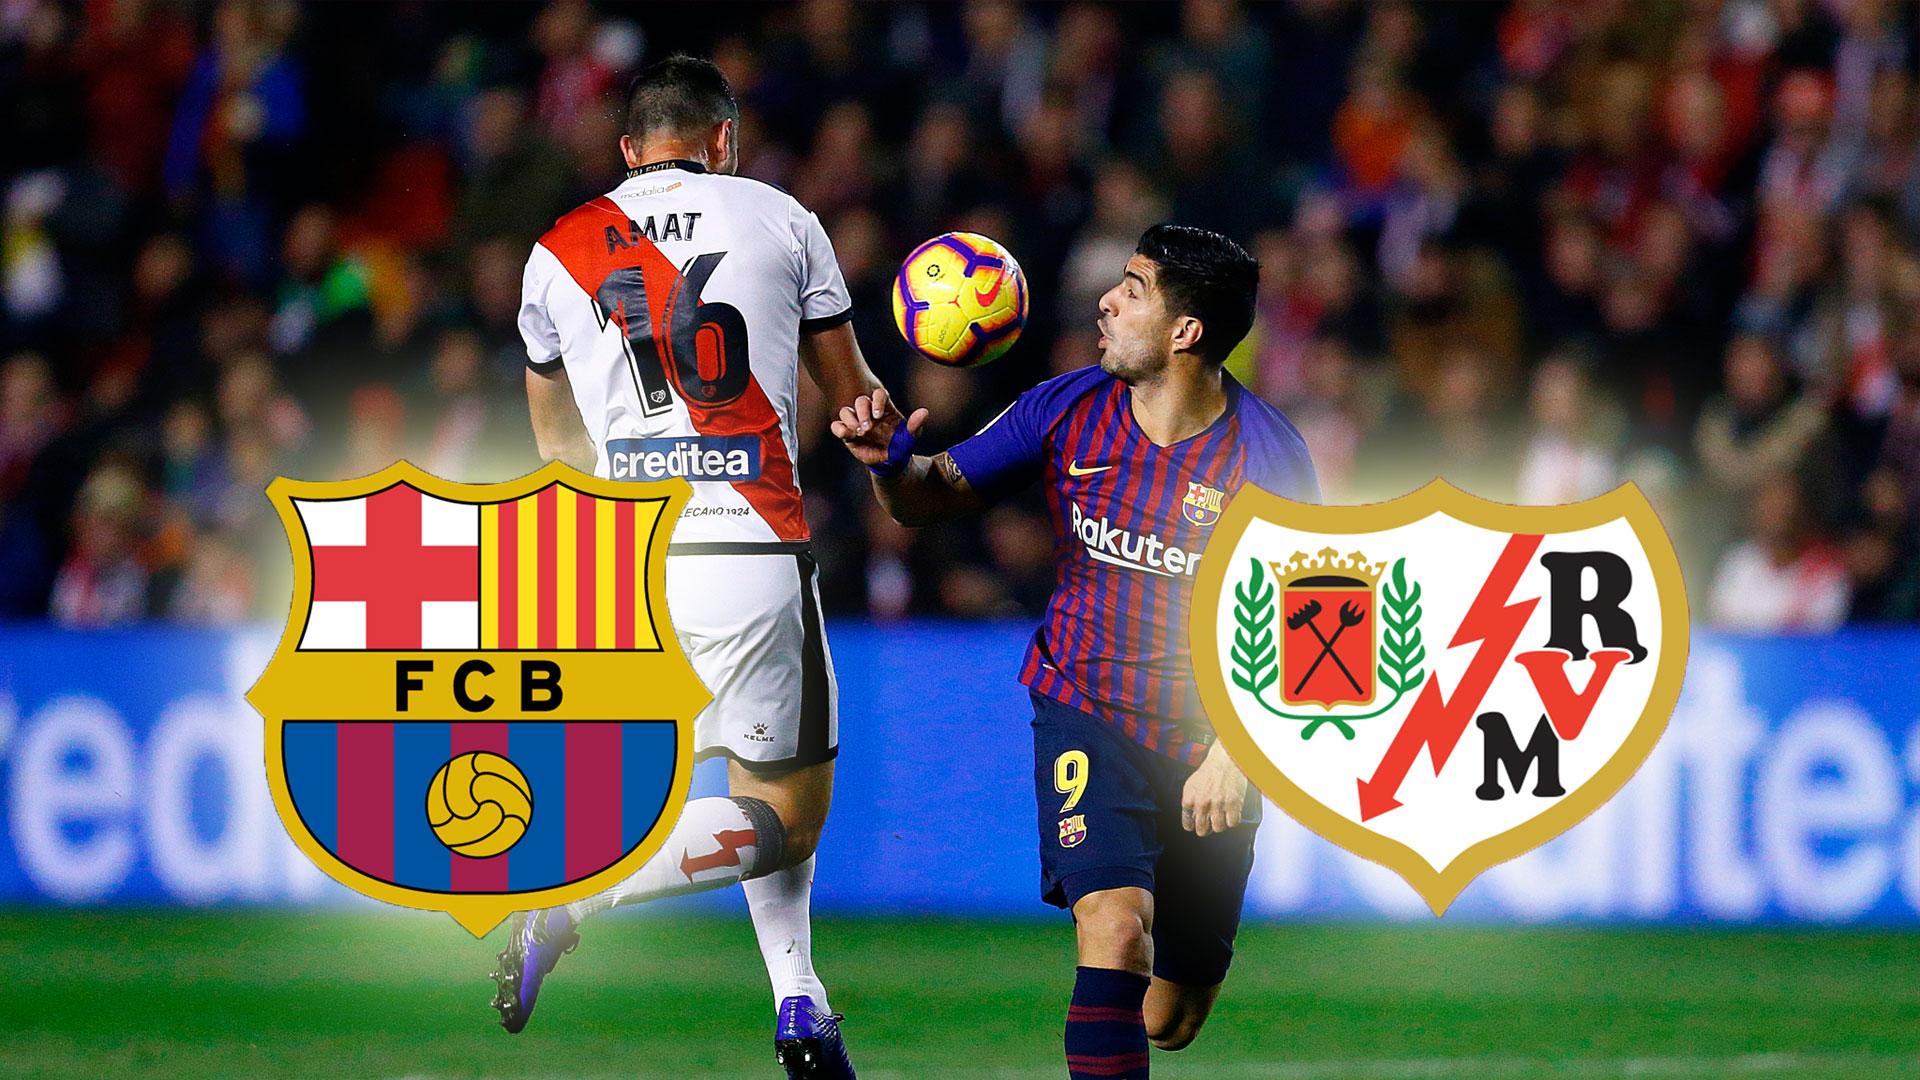 Barcelona Vs Rayo Vallecano Heute Live Im Tv Und Live Stream So